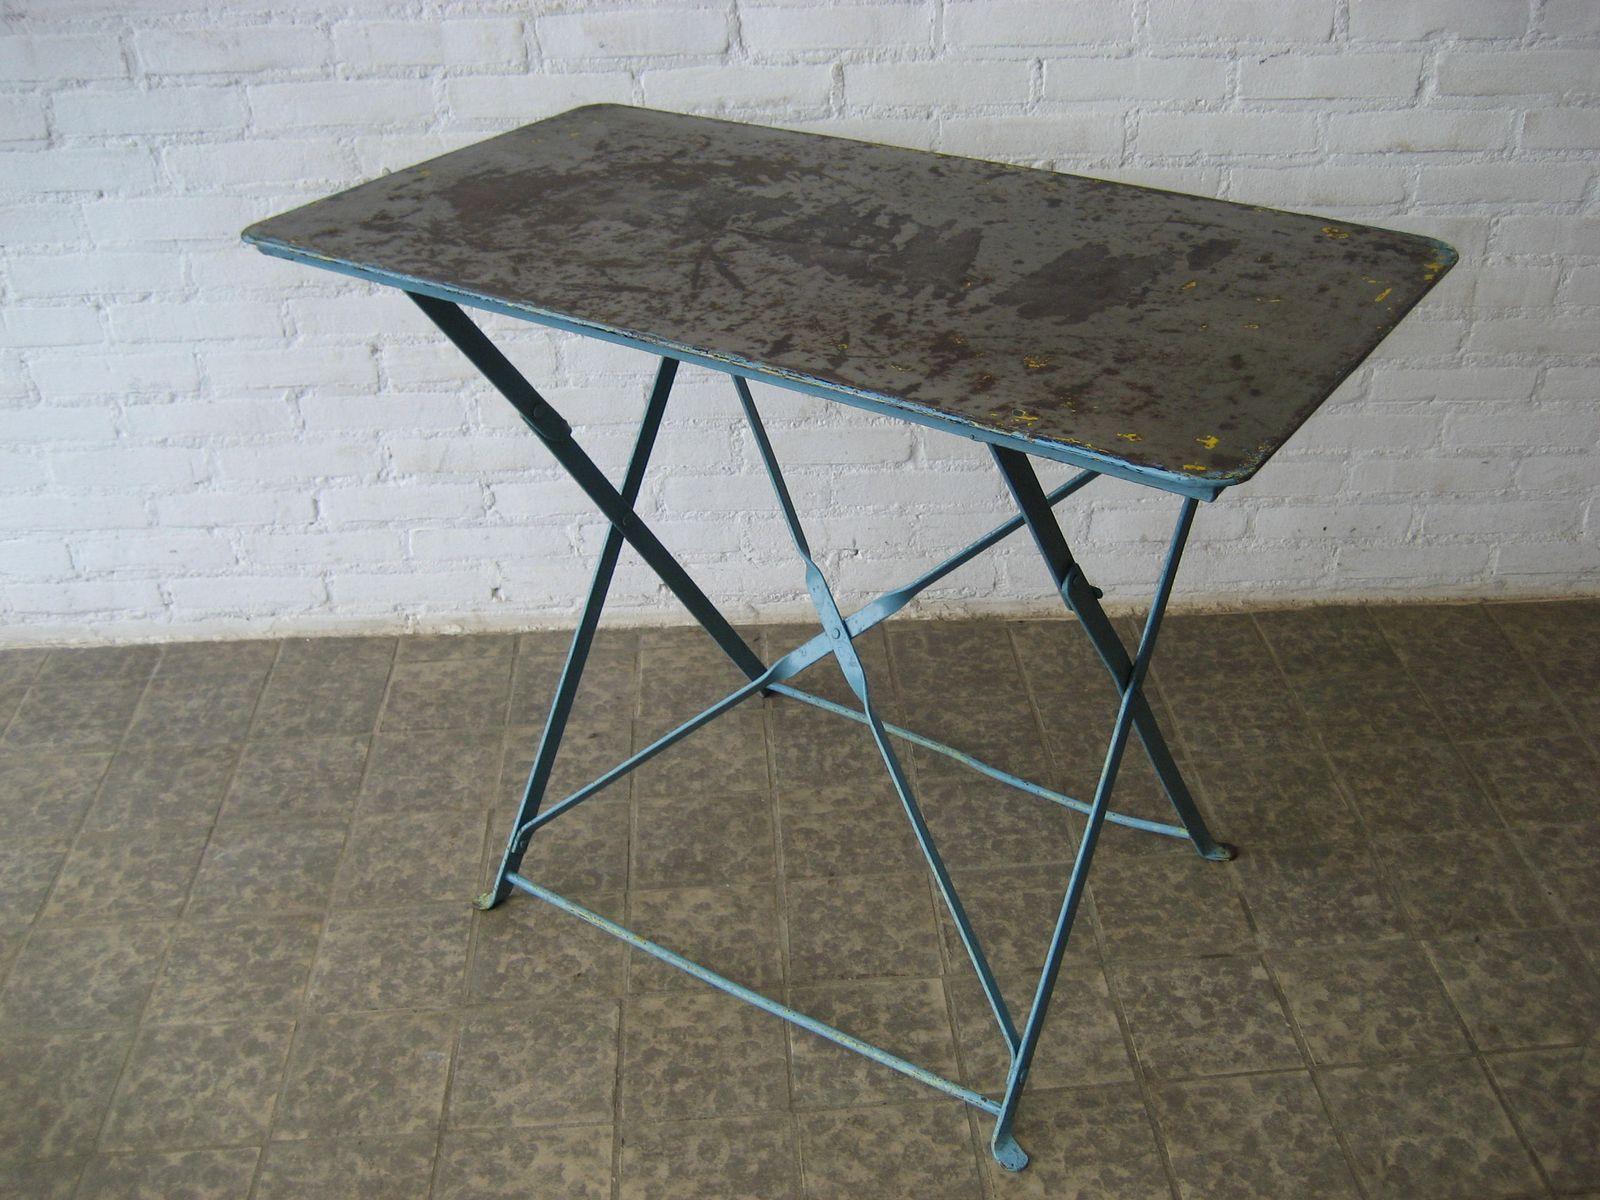 table de jardin industrielle en acier belgique en vente. Black Bedroom Furniture Sets. Home Design Ideas